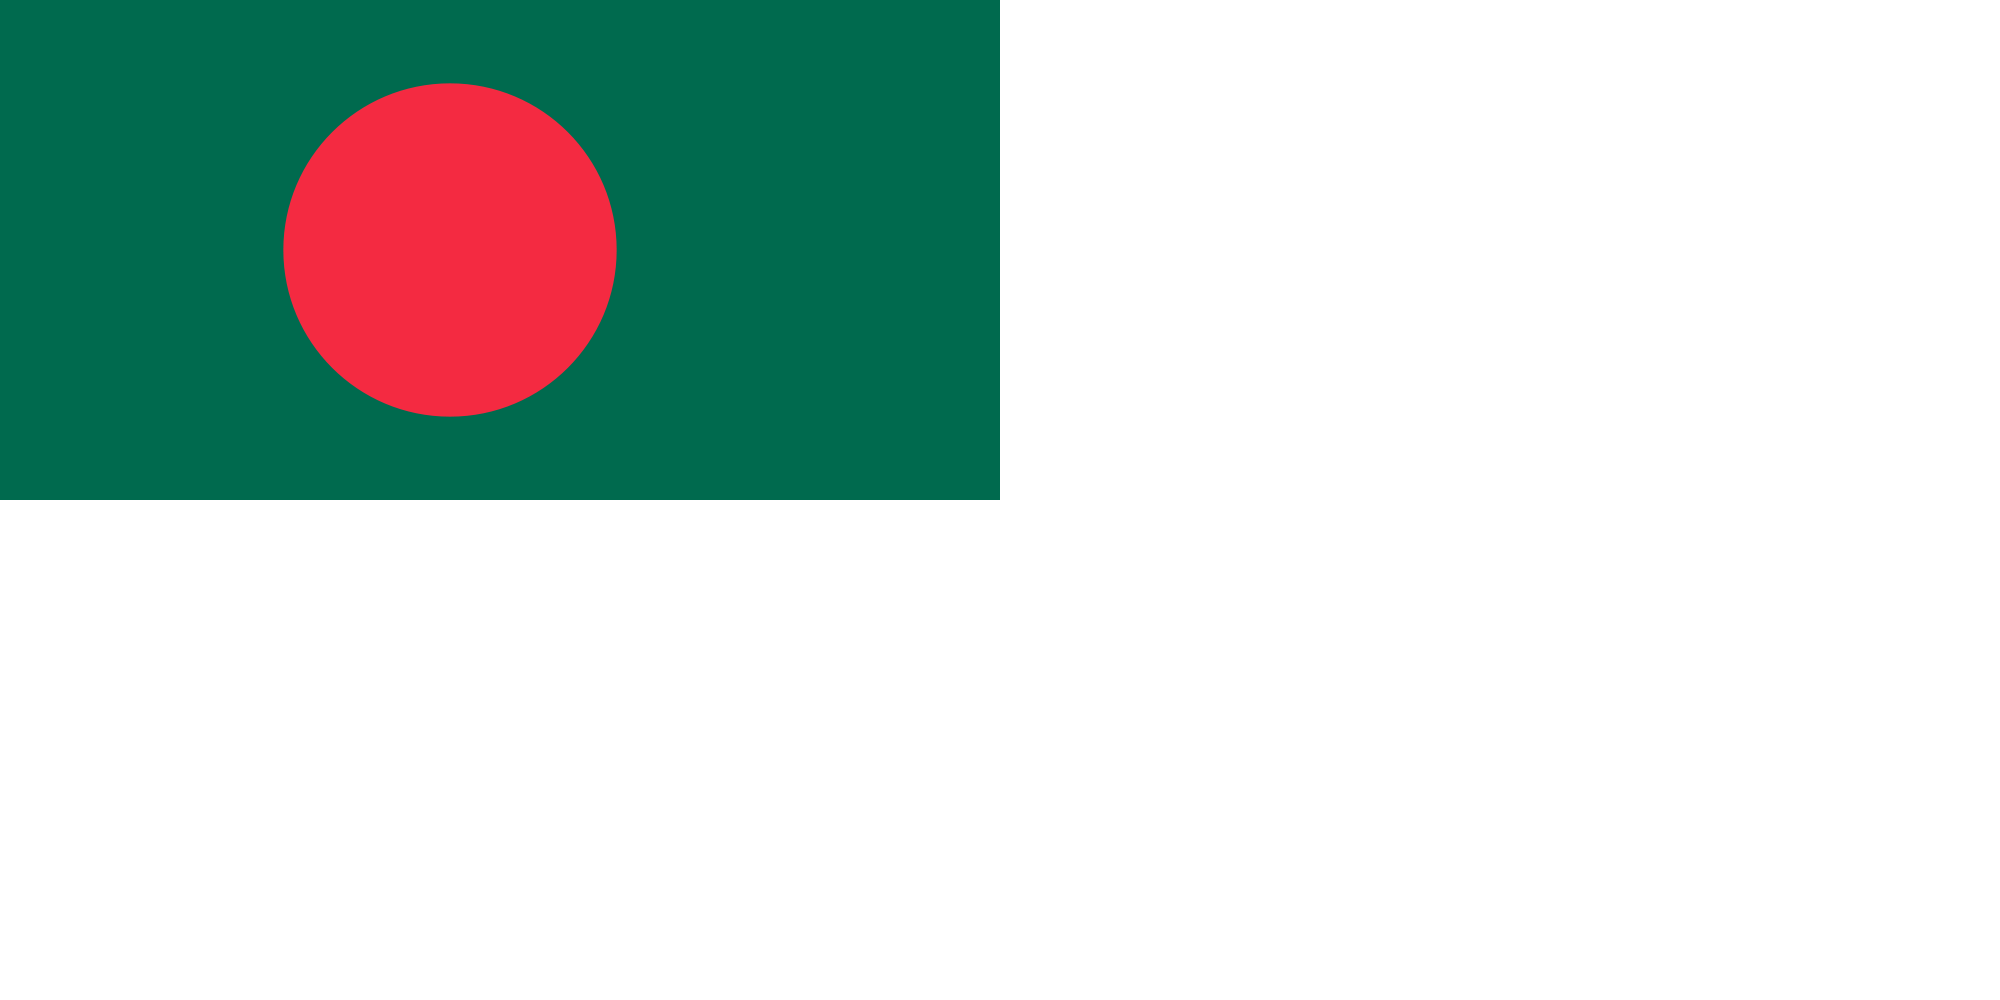 Bangladesh (Naval ensign)